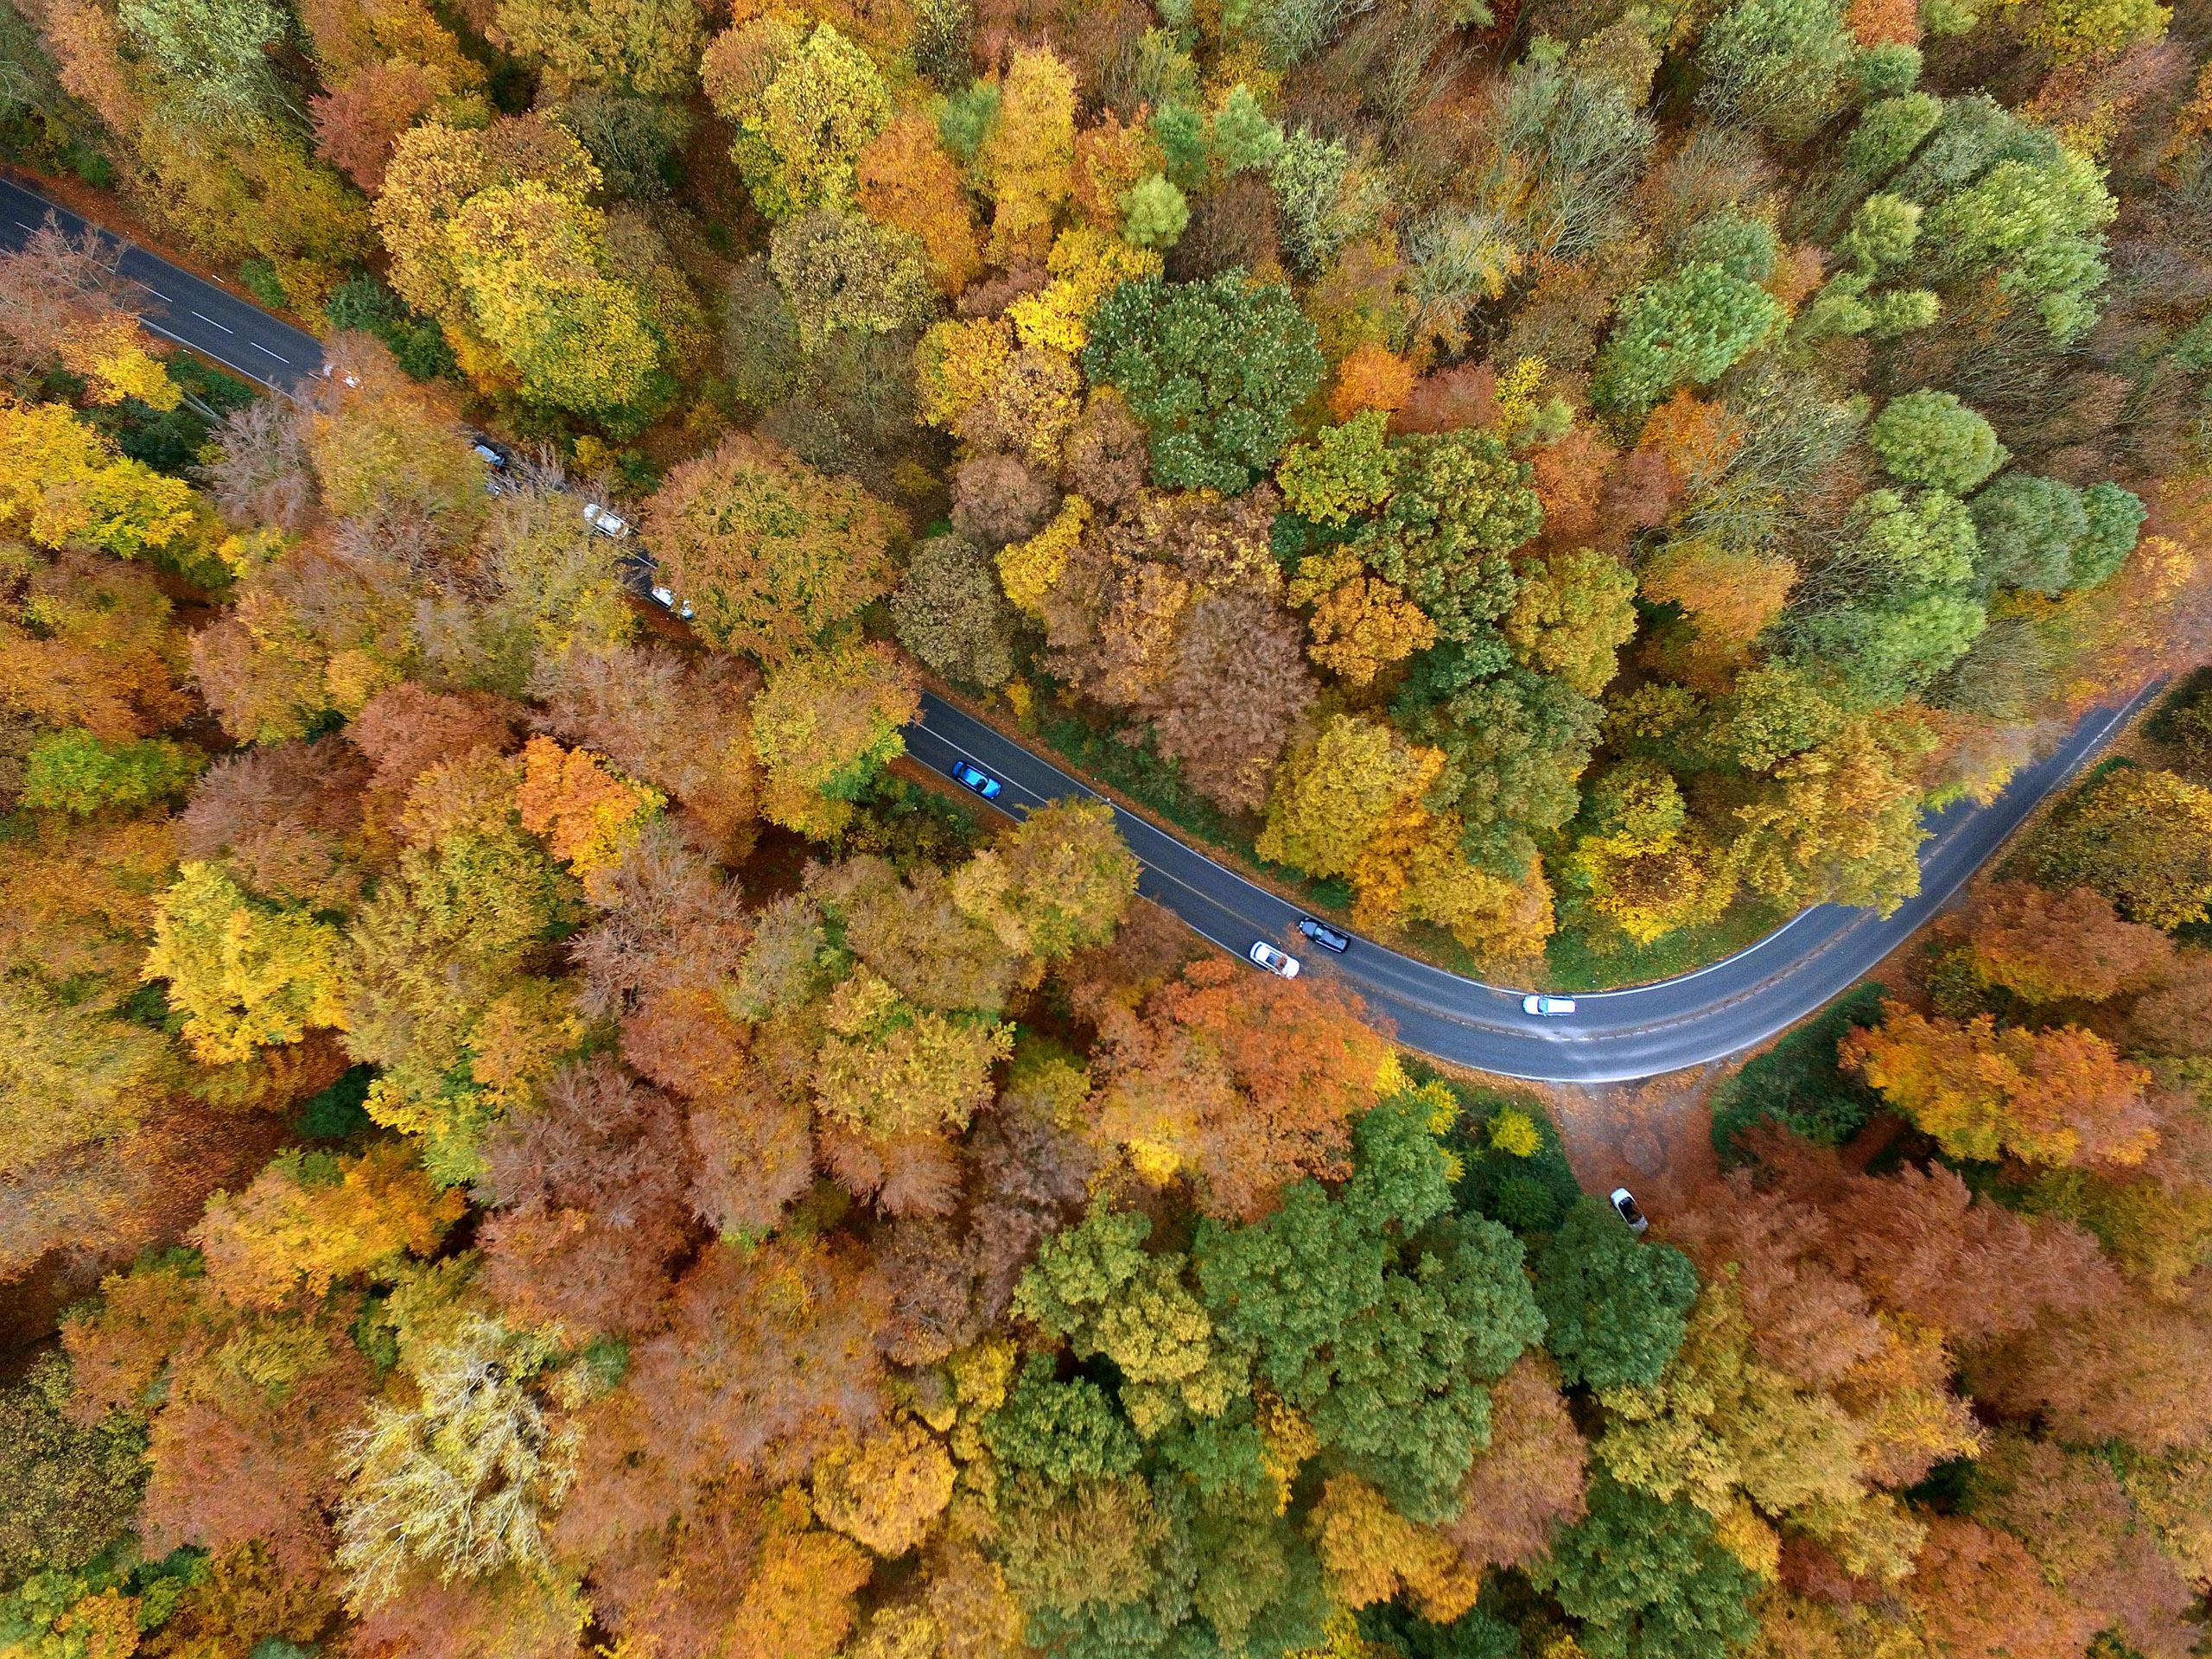 Autumnal colored landscape in Cologne, Germany, on Nov. 4, 2016